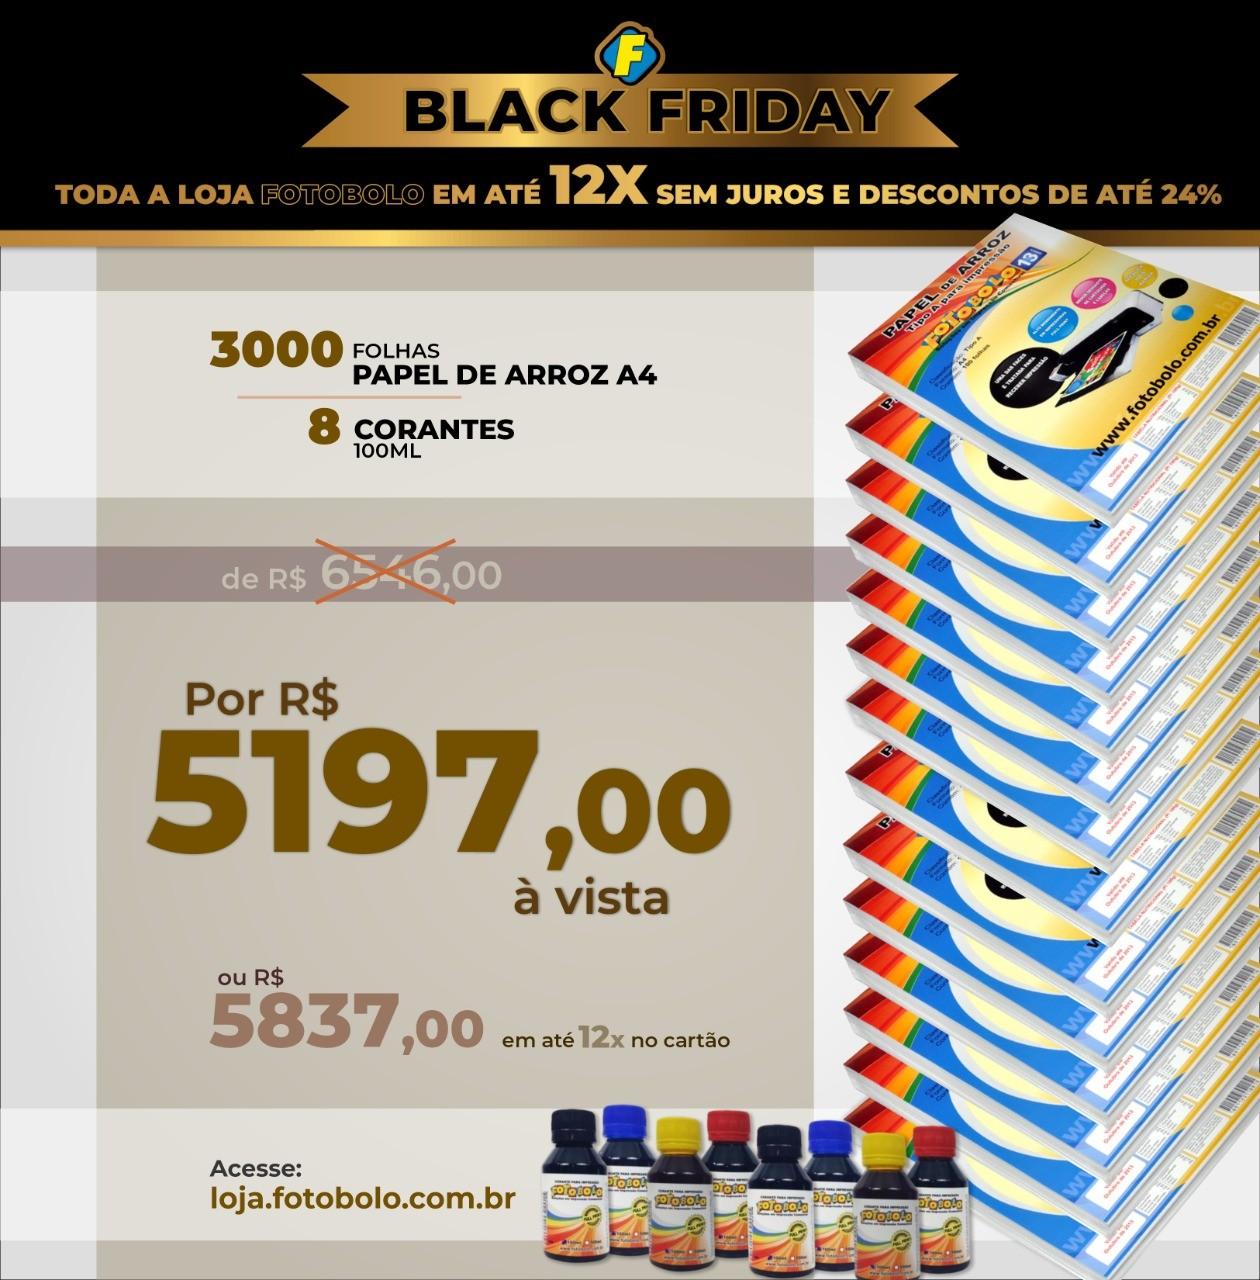 COMBO BLACK FRIDAY - 3000 Papéis Arroz TIPO A A4 + 2 Kits Corante 100ml ( 8 Frascos + 8 Bicos)